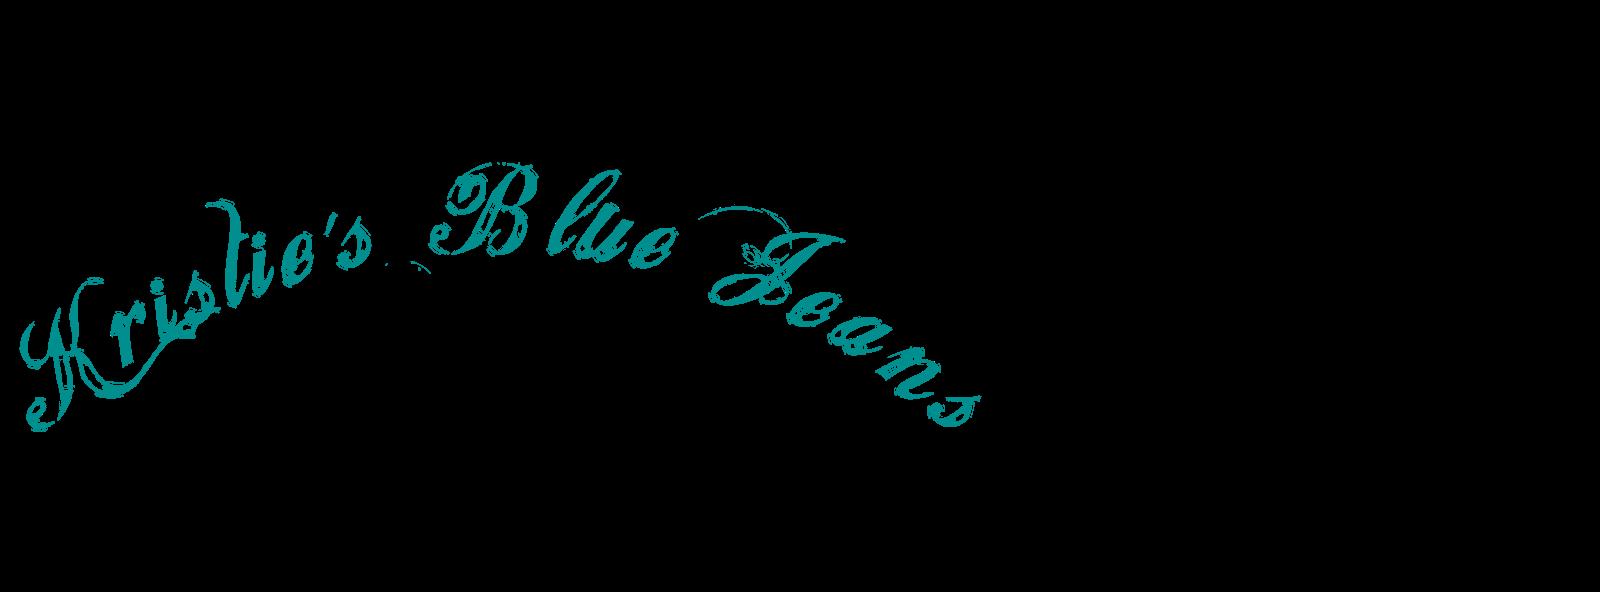 Kristie's Blue Jeans